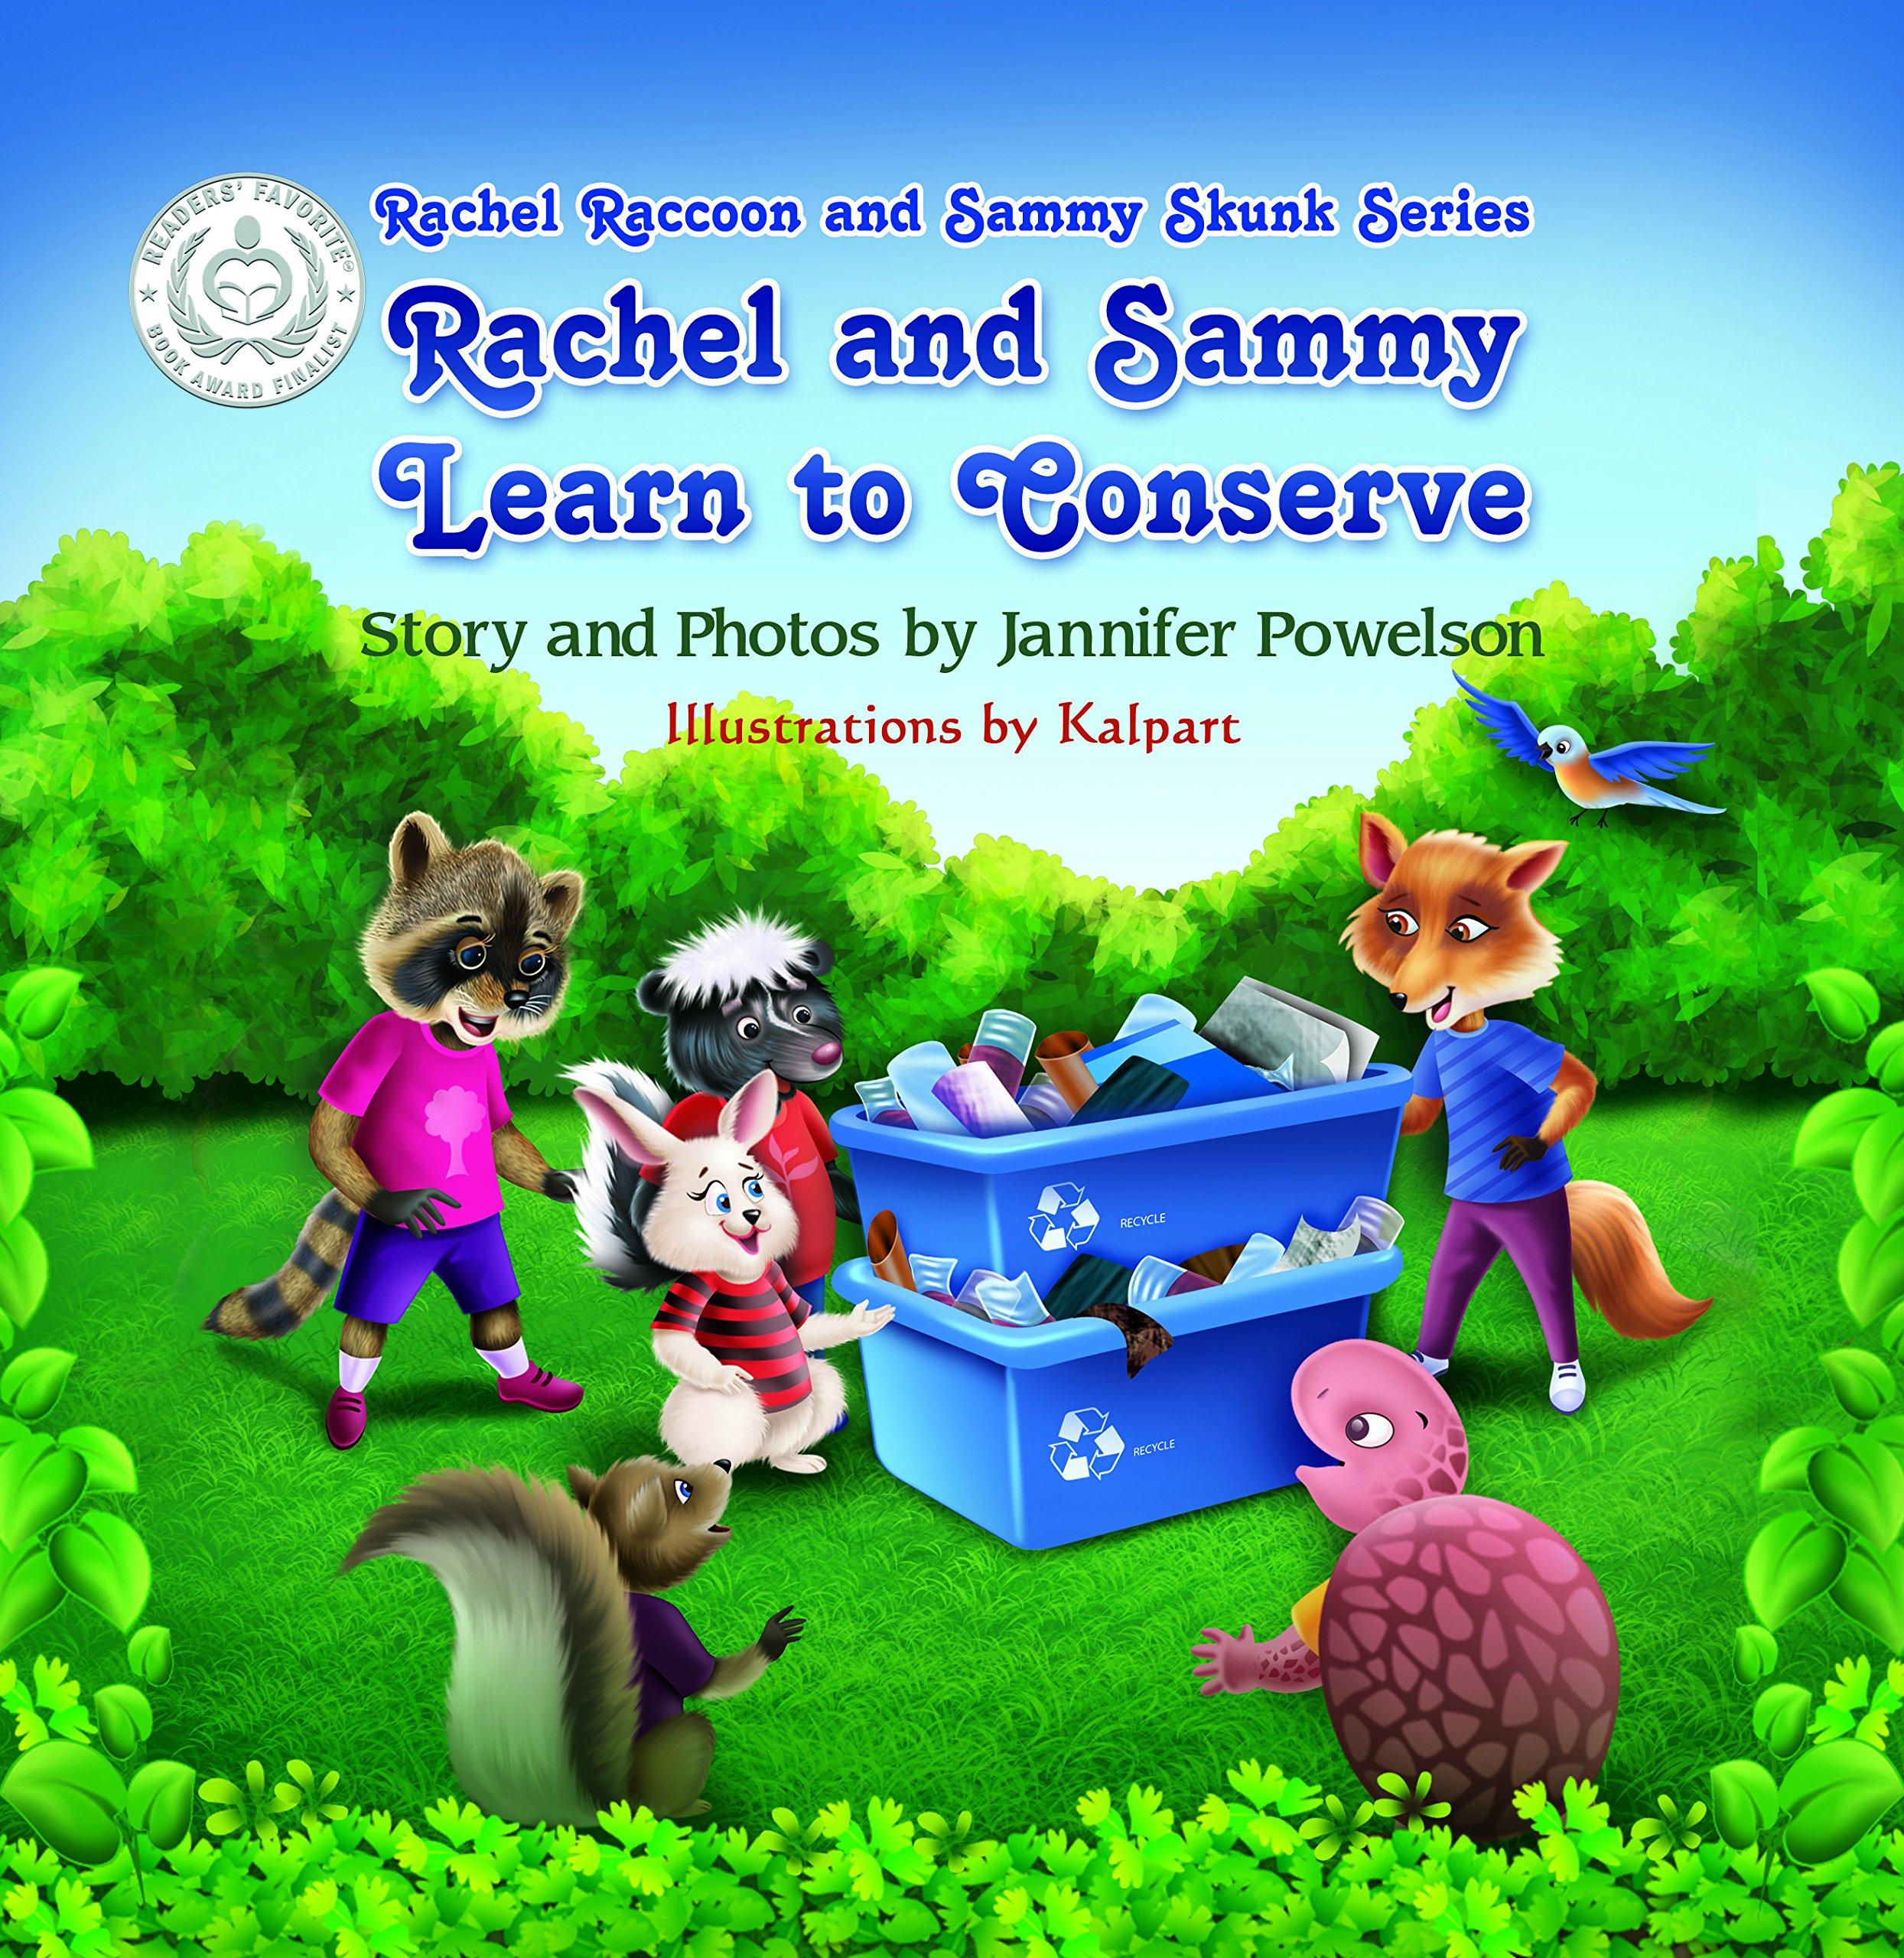 Rachel and Sammy Learn to Conserve  (Rachel Raccoon and Sammy Skunk) PDF